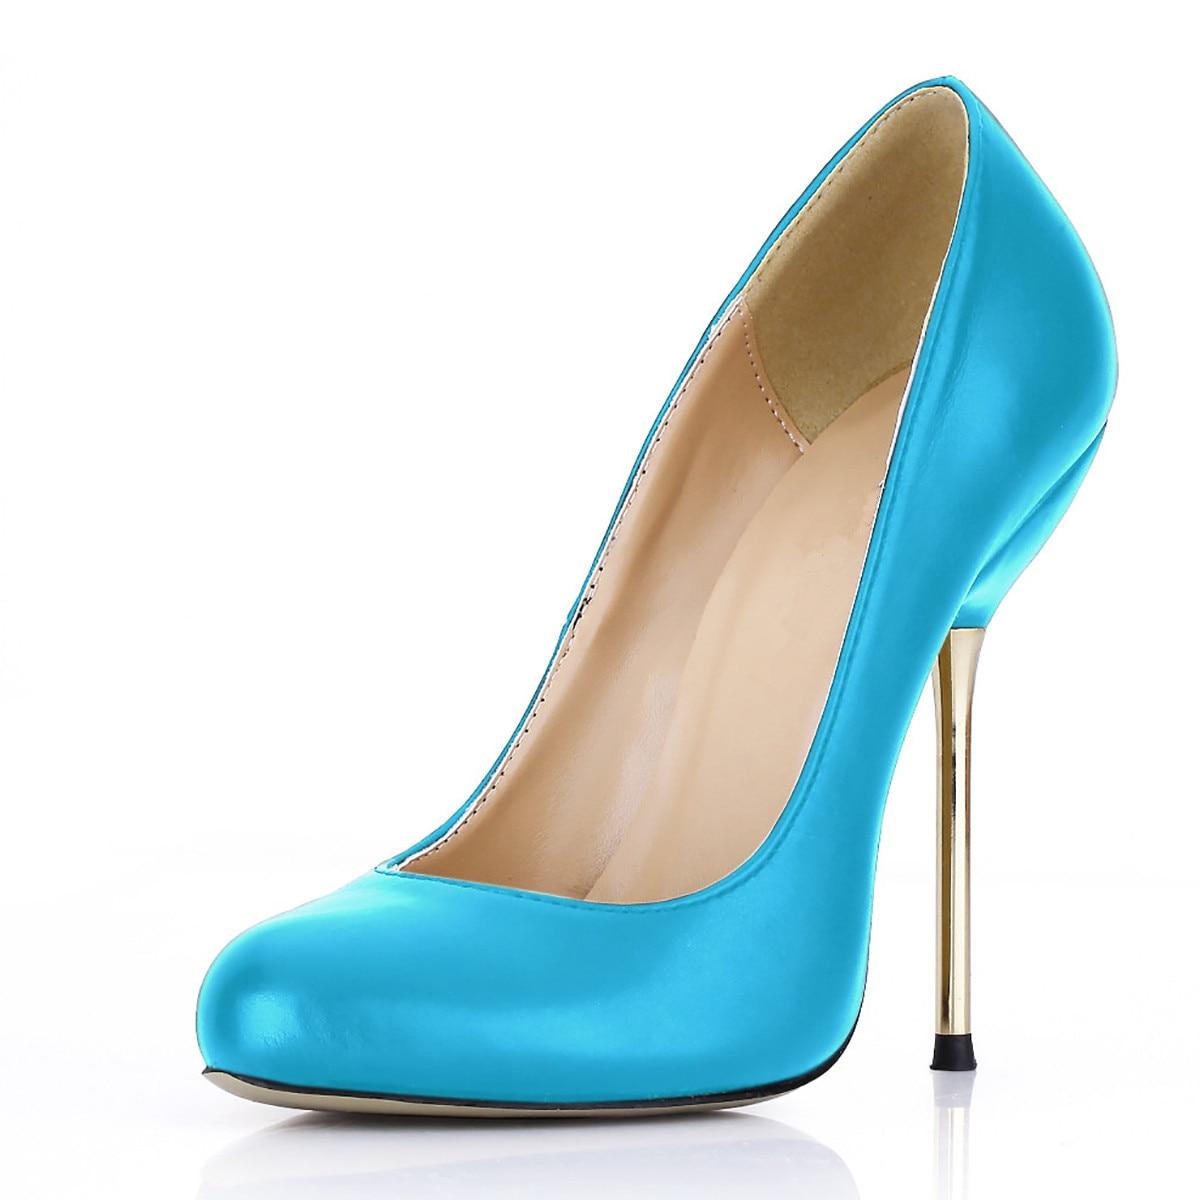 Crossdresser Celebrity Popular Stiletto 12cm thin heels shoes woman zapatos mujer low-top cd club Ladies sexy SM pumps US11 12